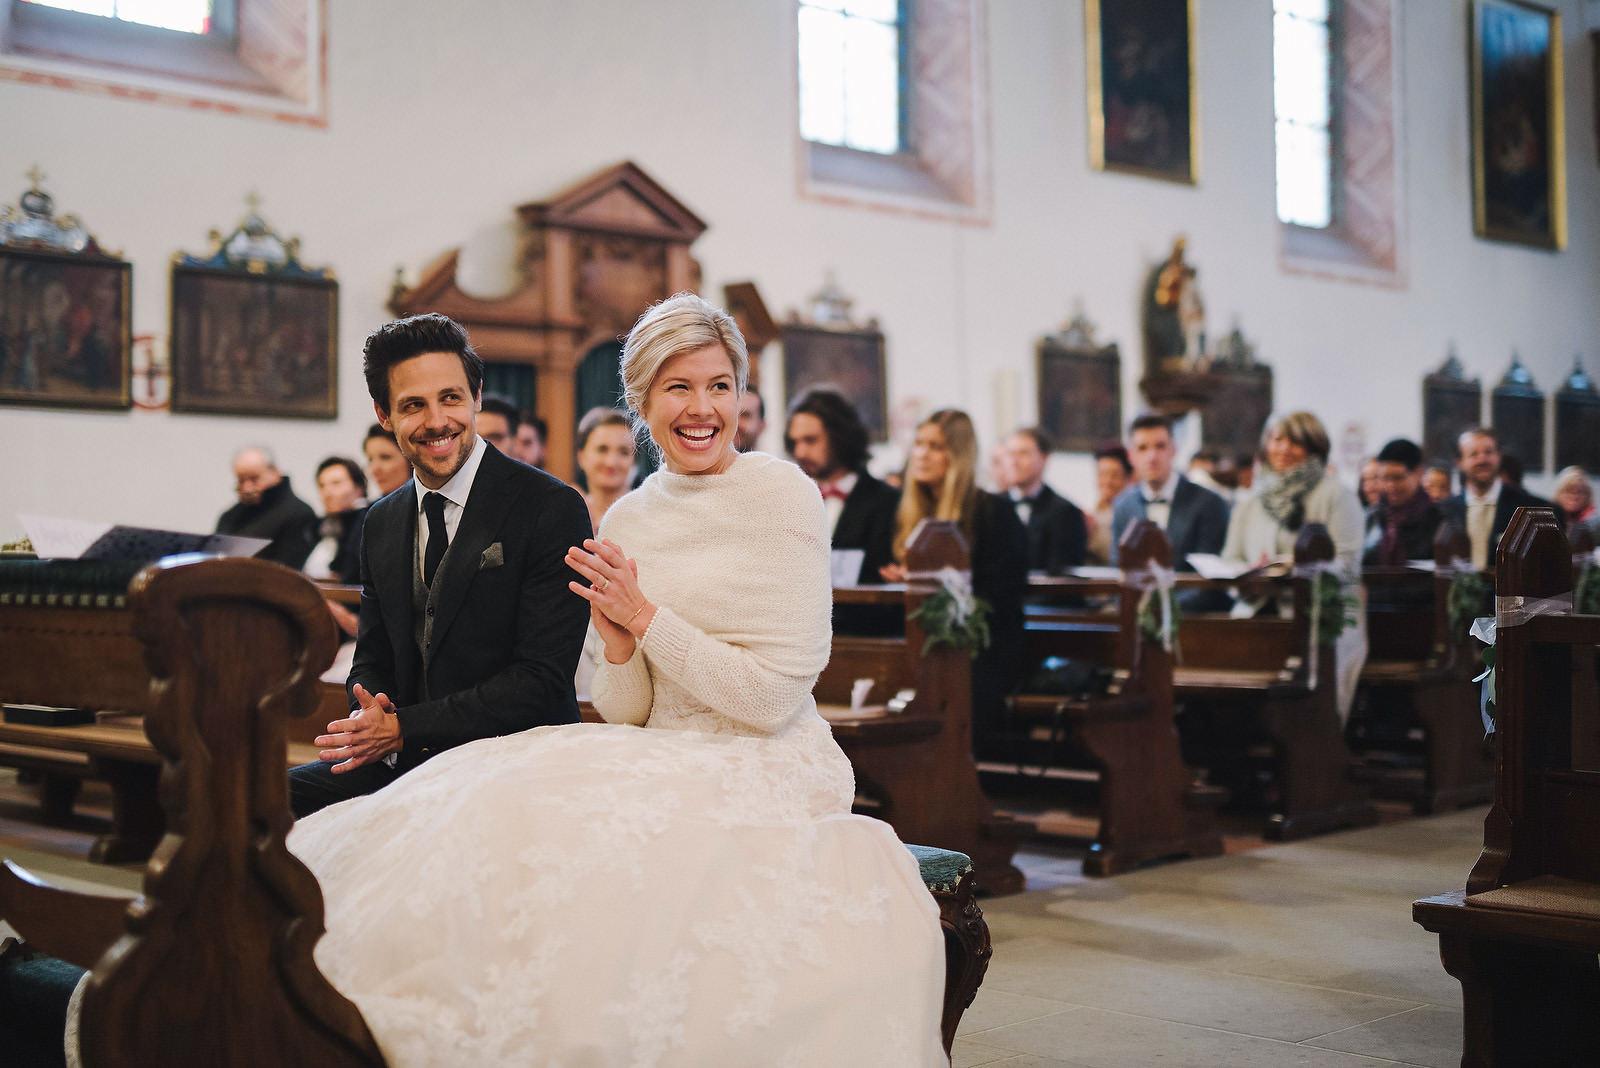 Fotograf Konstanz - Silvester Wedding in Hagnau / Friedrichshafen at Lake of Constance  - 19 -